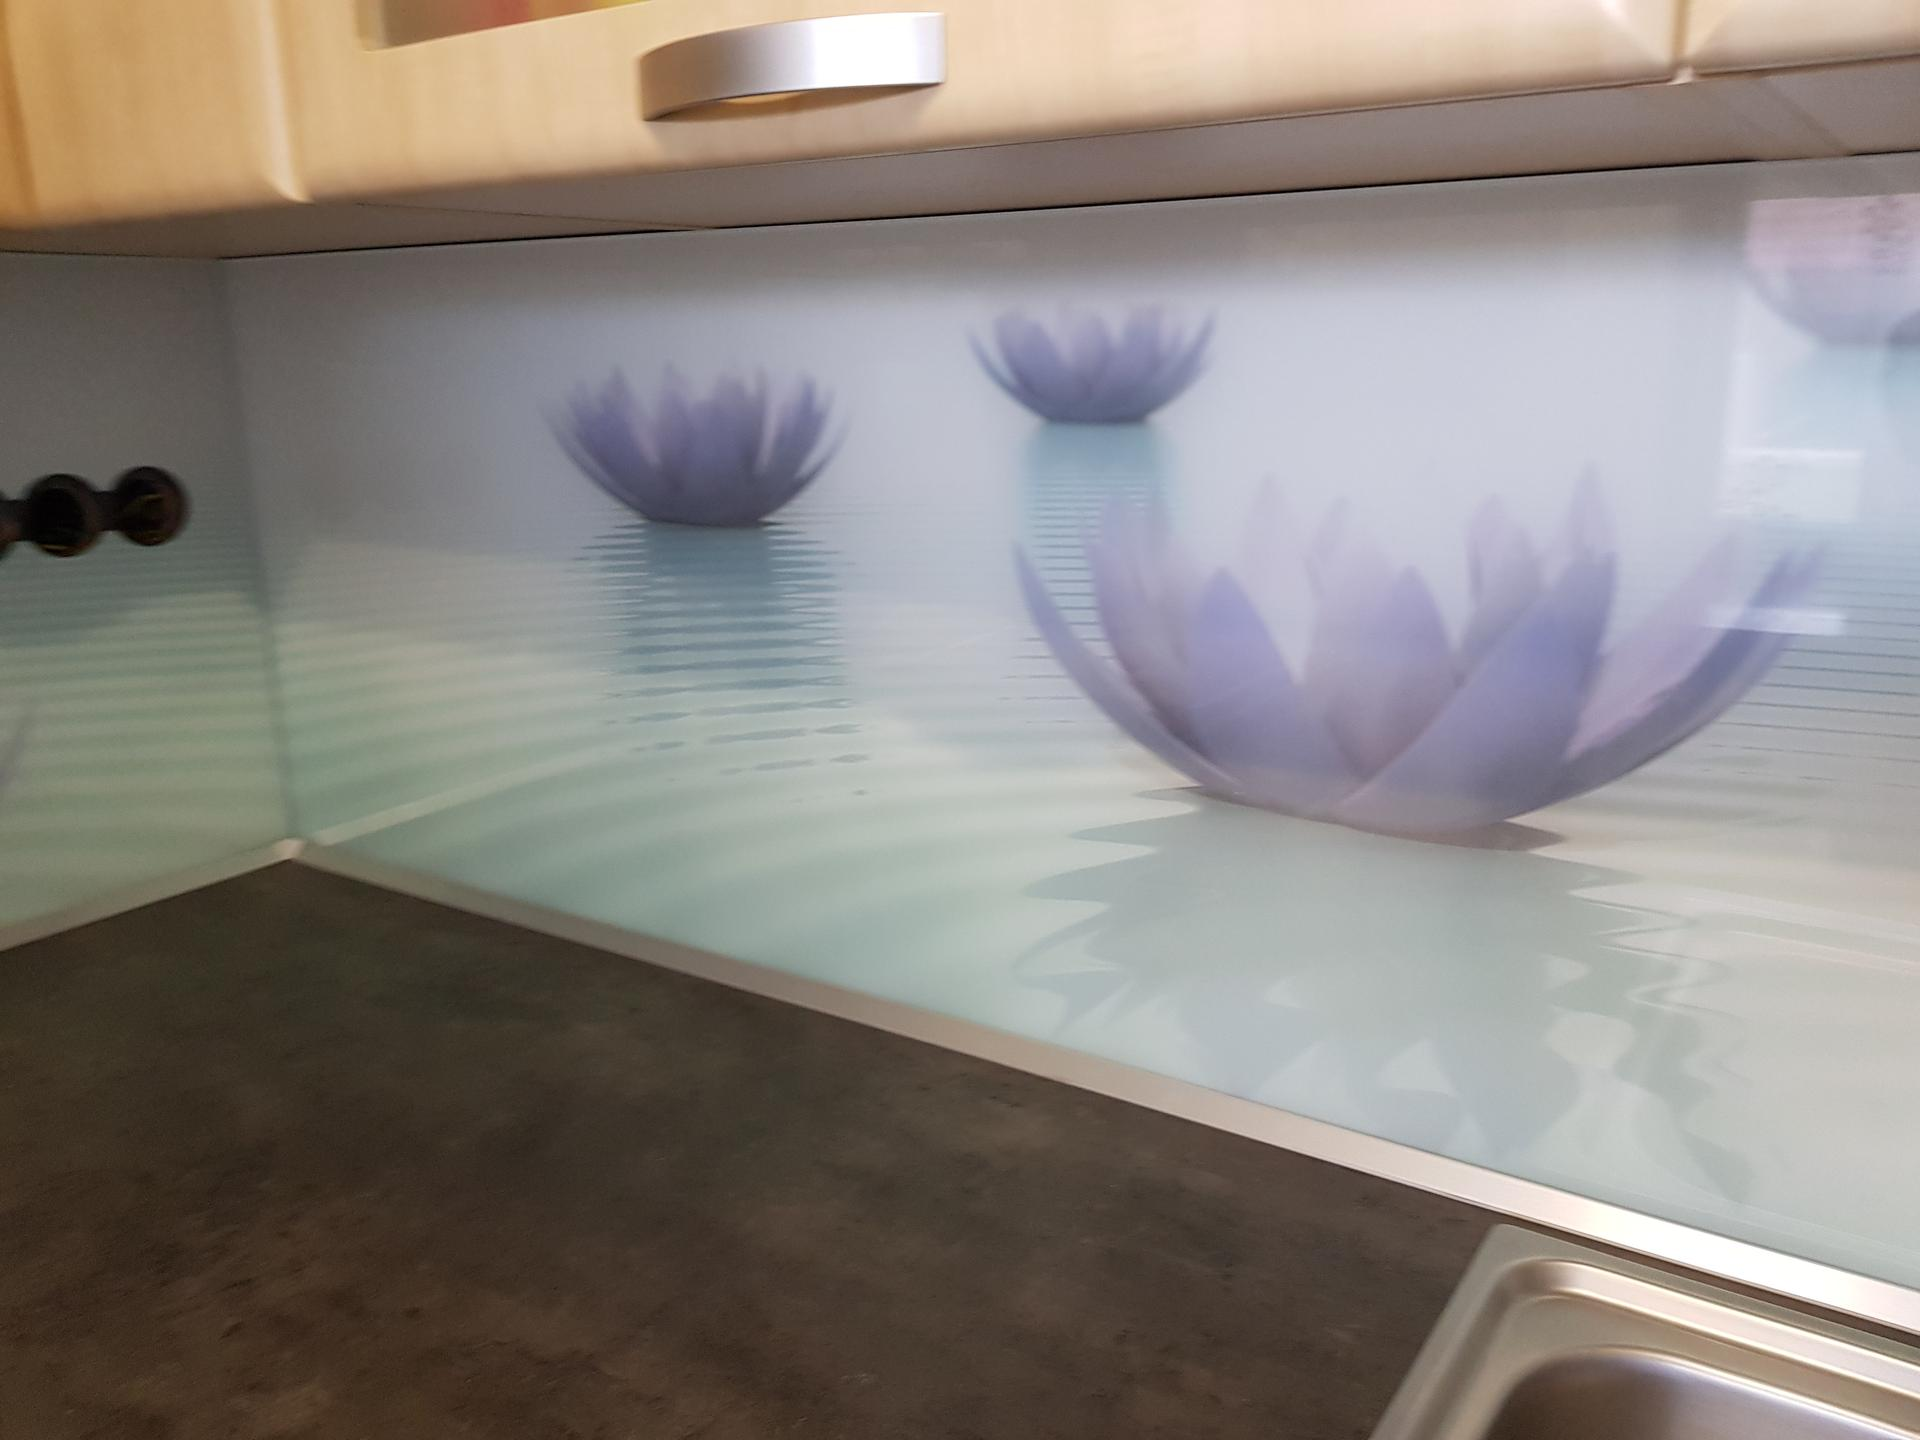 Dodávka a montáž sklenenej zásteny s motívom(Kúty). - Obrázok č. 1